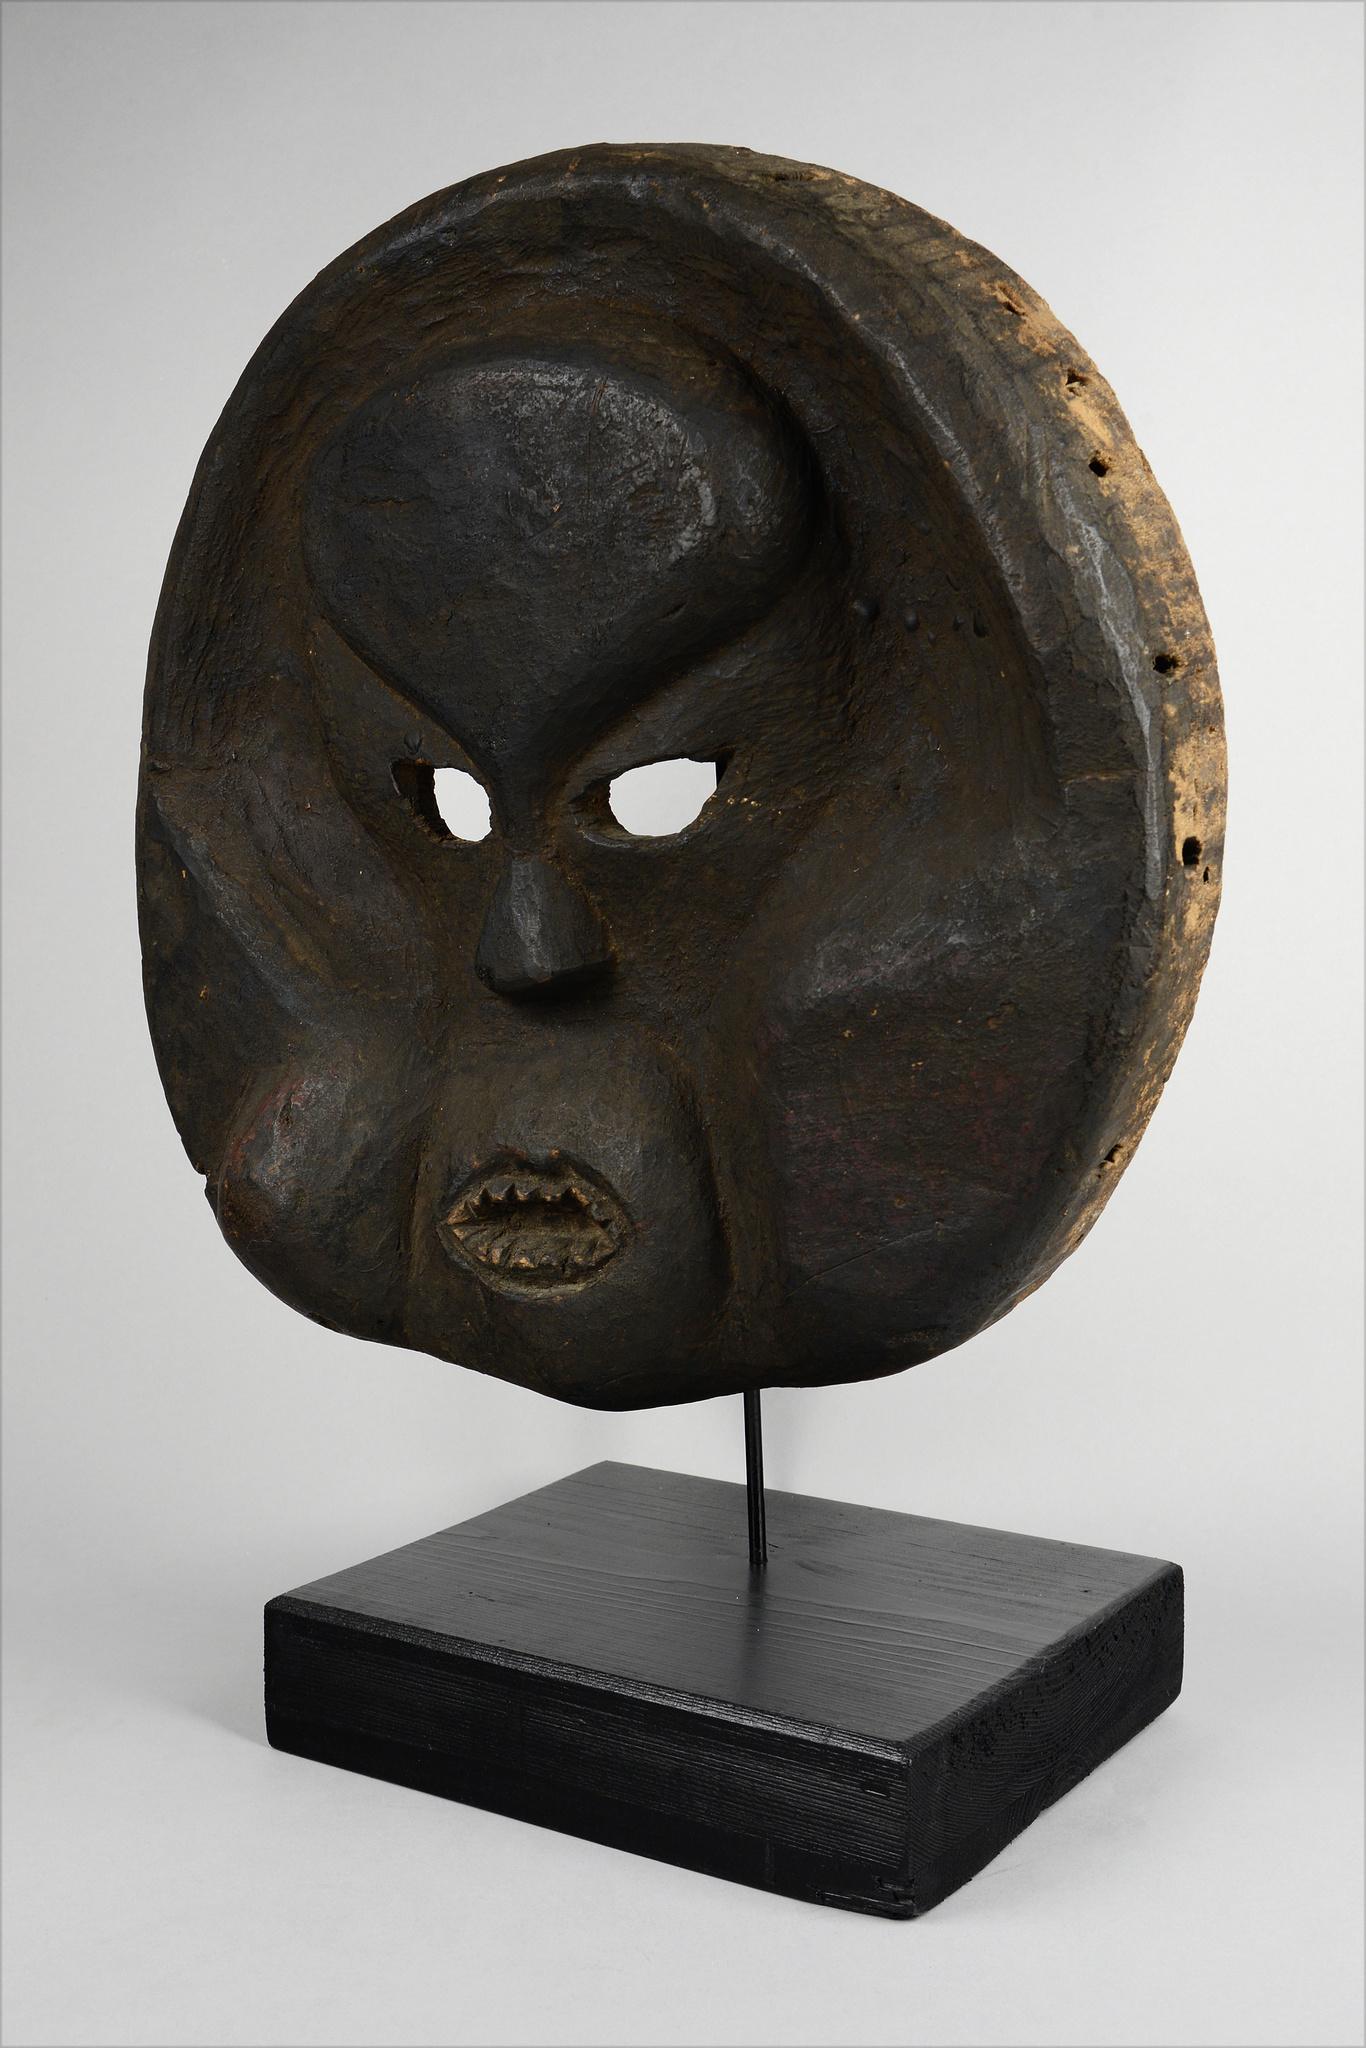 "Große scheibenförmige Deformations-Maske ""idiok ekpo"""